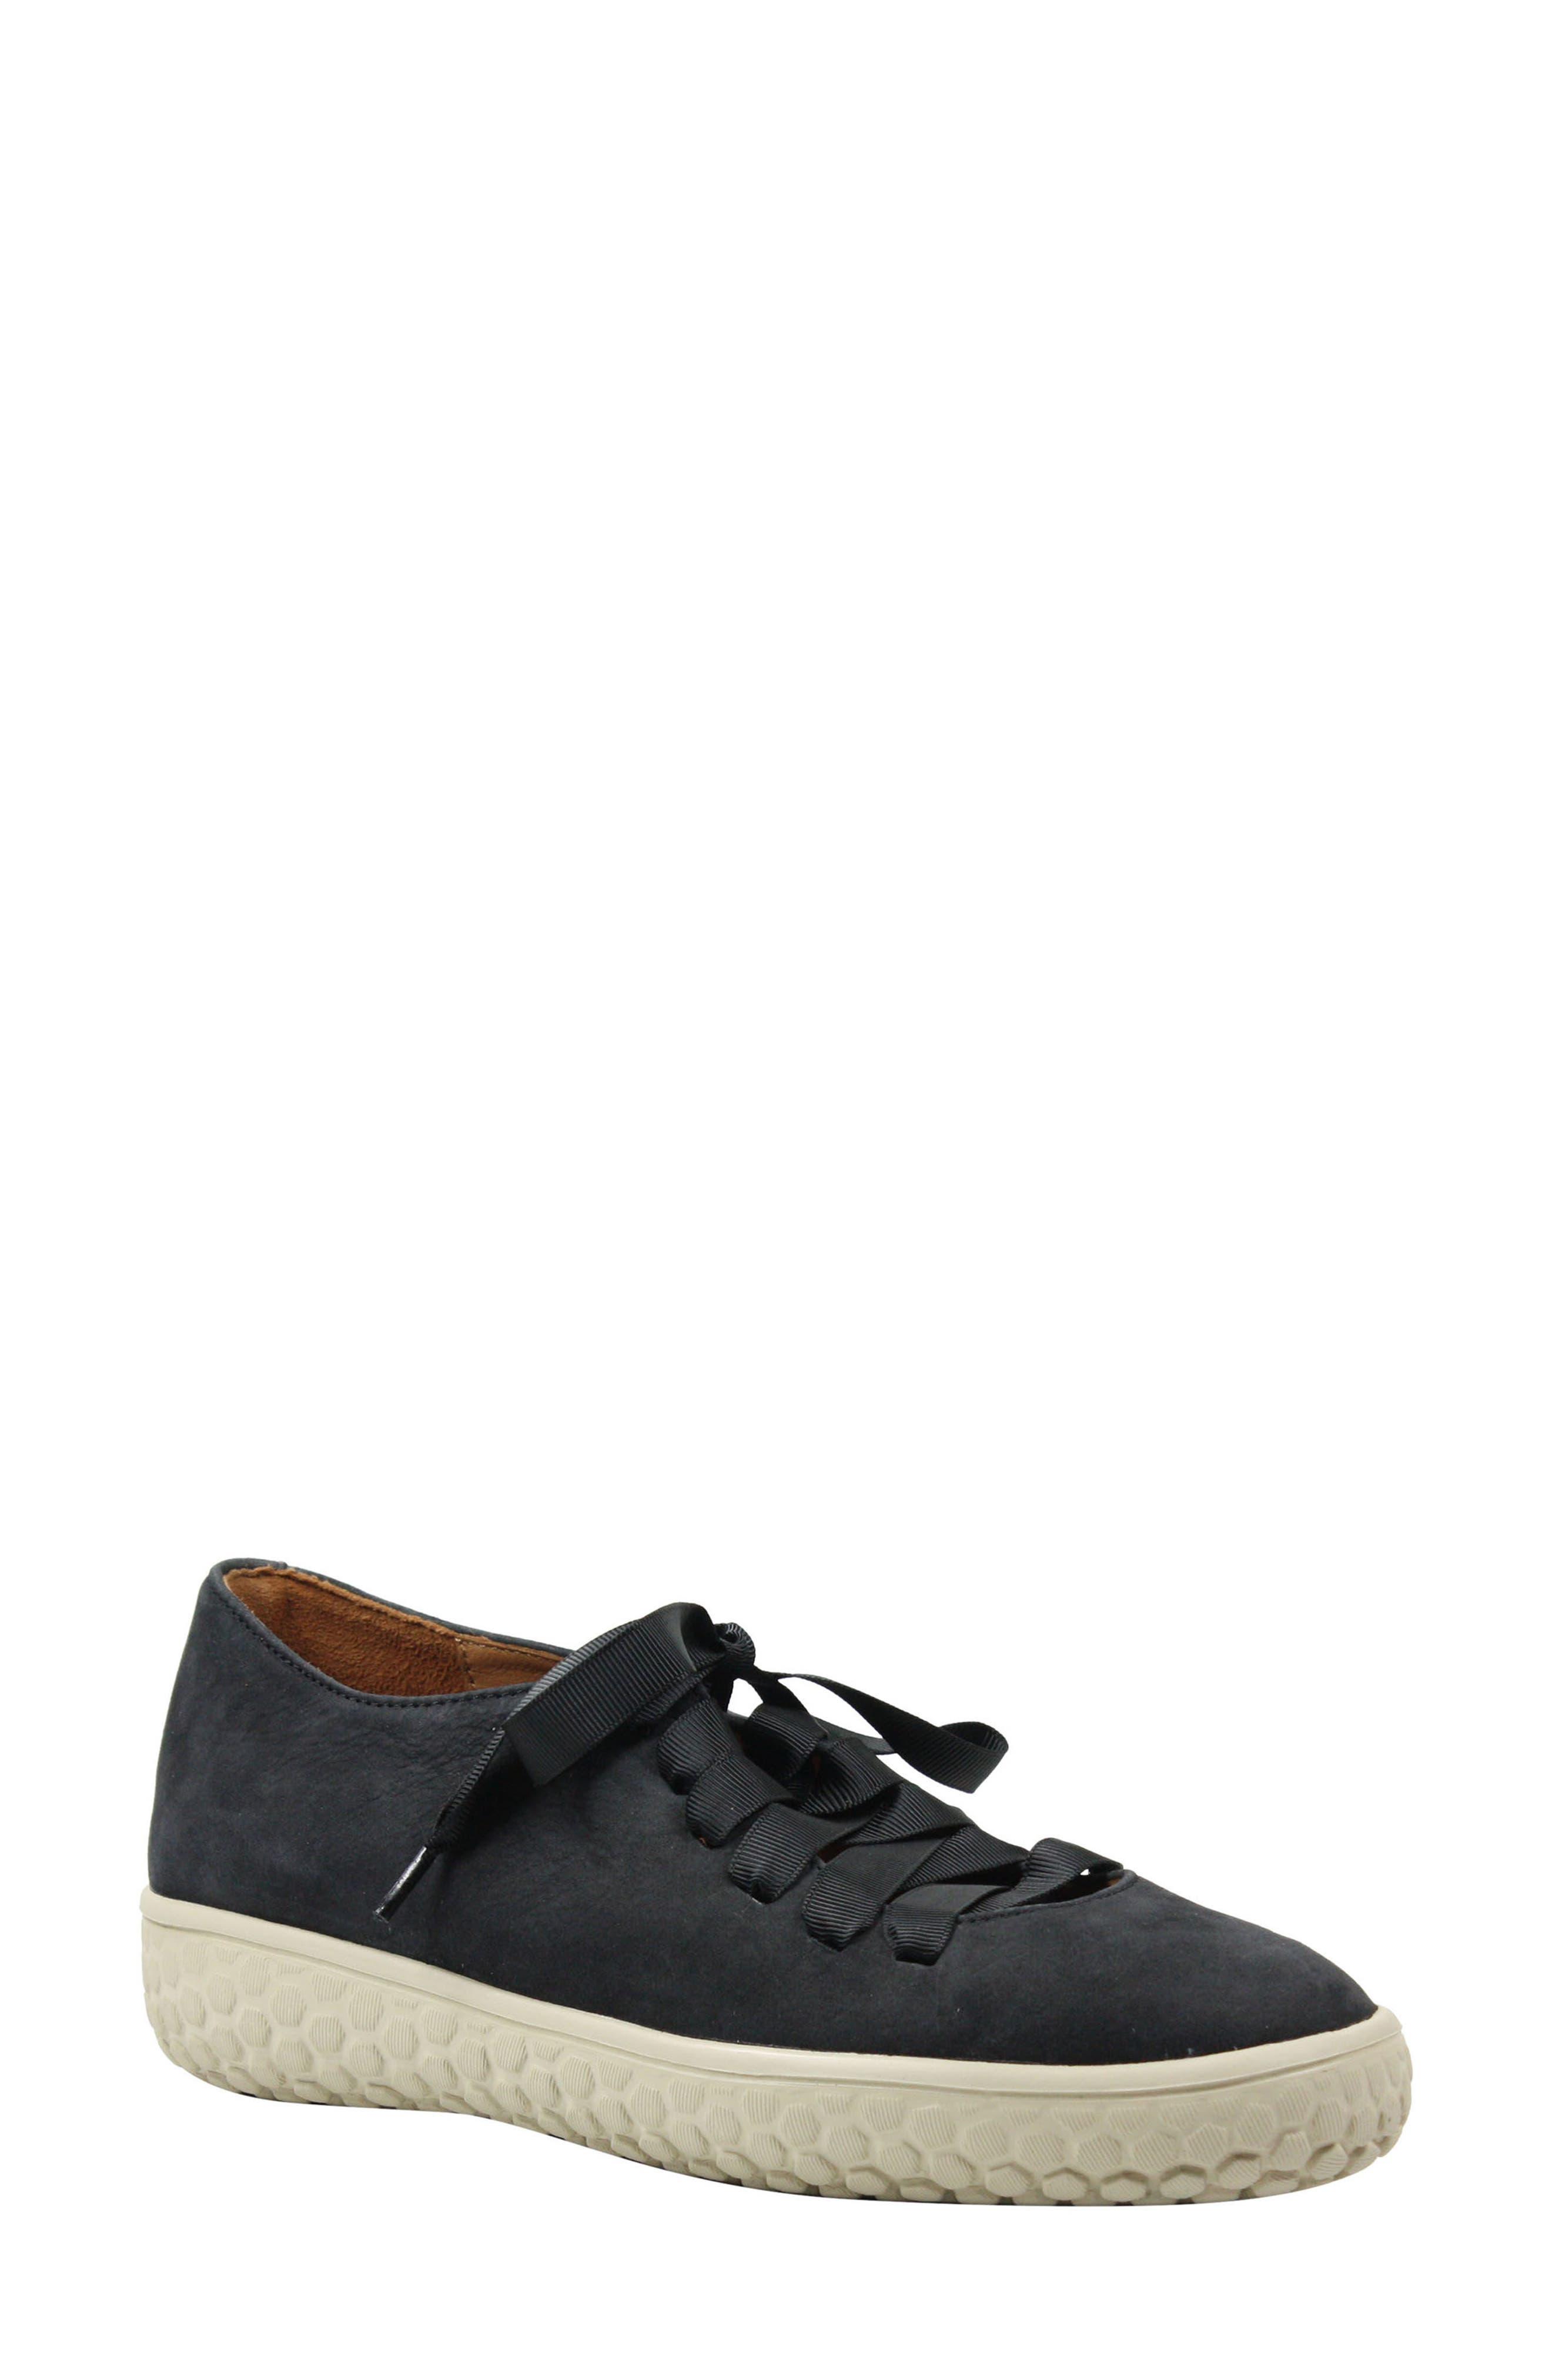 L'AMOUR DES PIEDS Zaheera Sneaker, Main, color, BLACK NUBUCK LEATHER